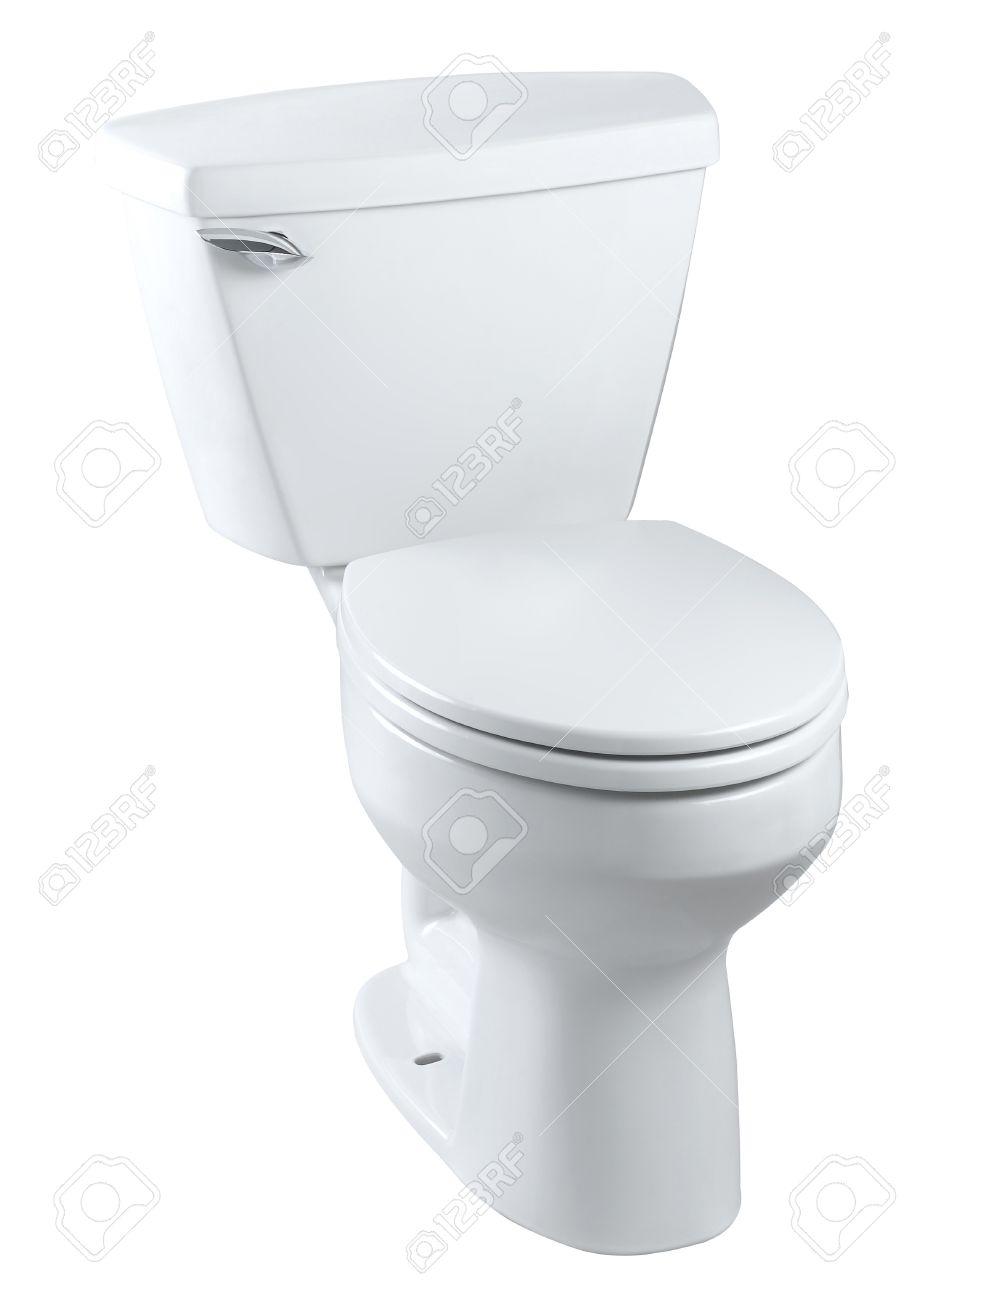 classical sanitary toilet bowl Stock Photo - 18208217